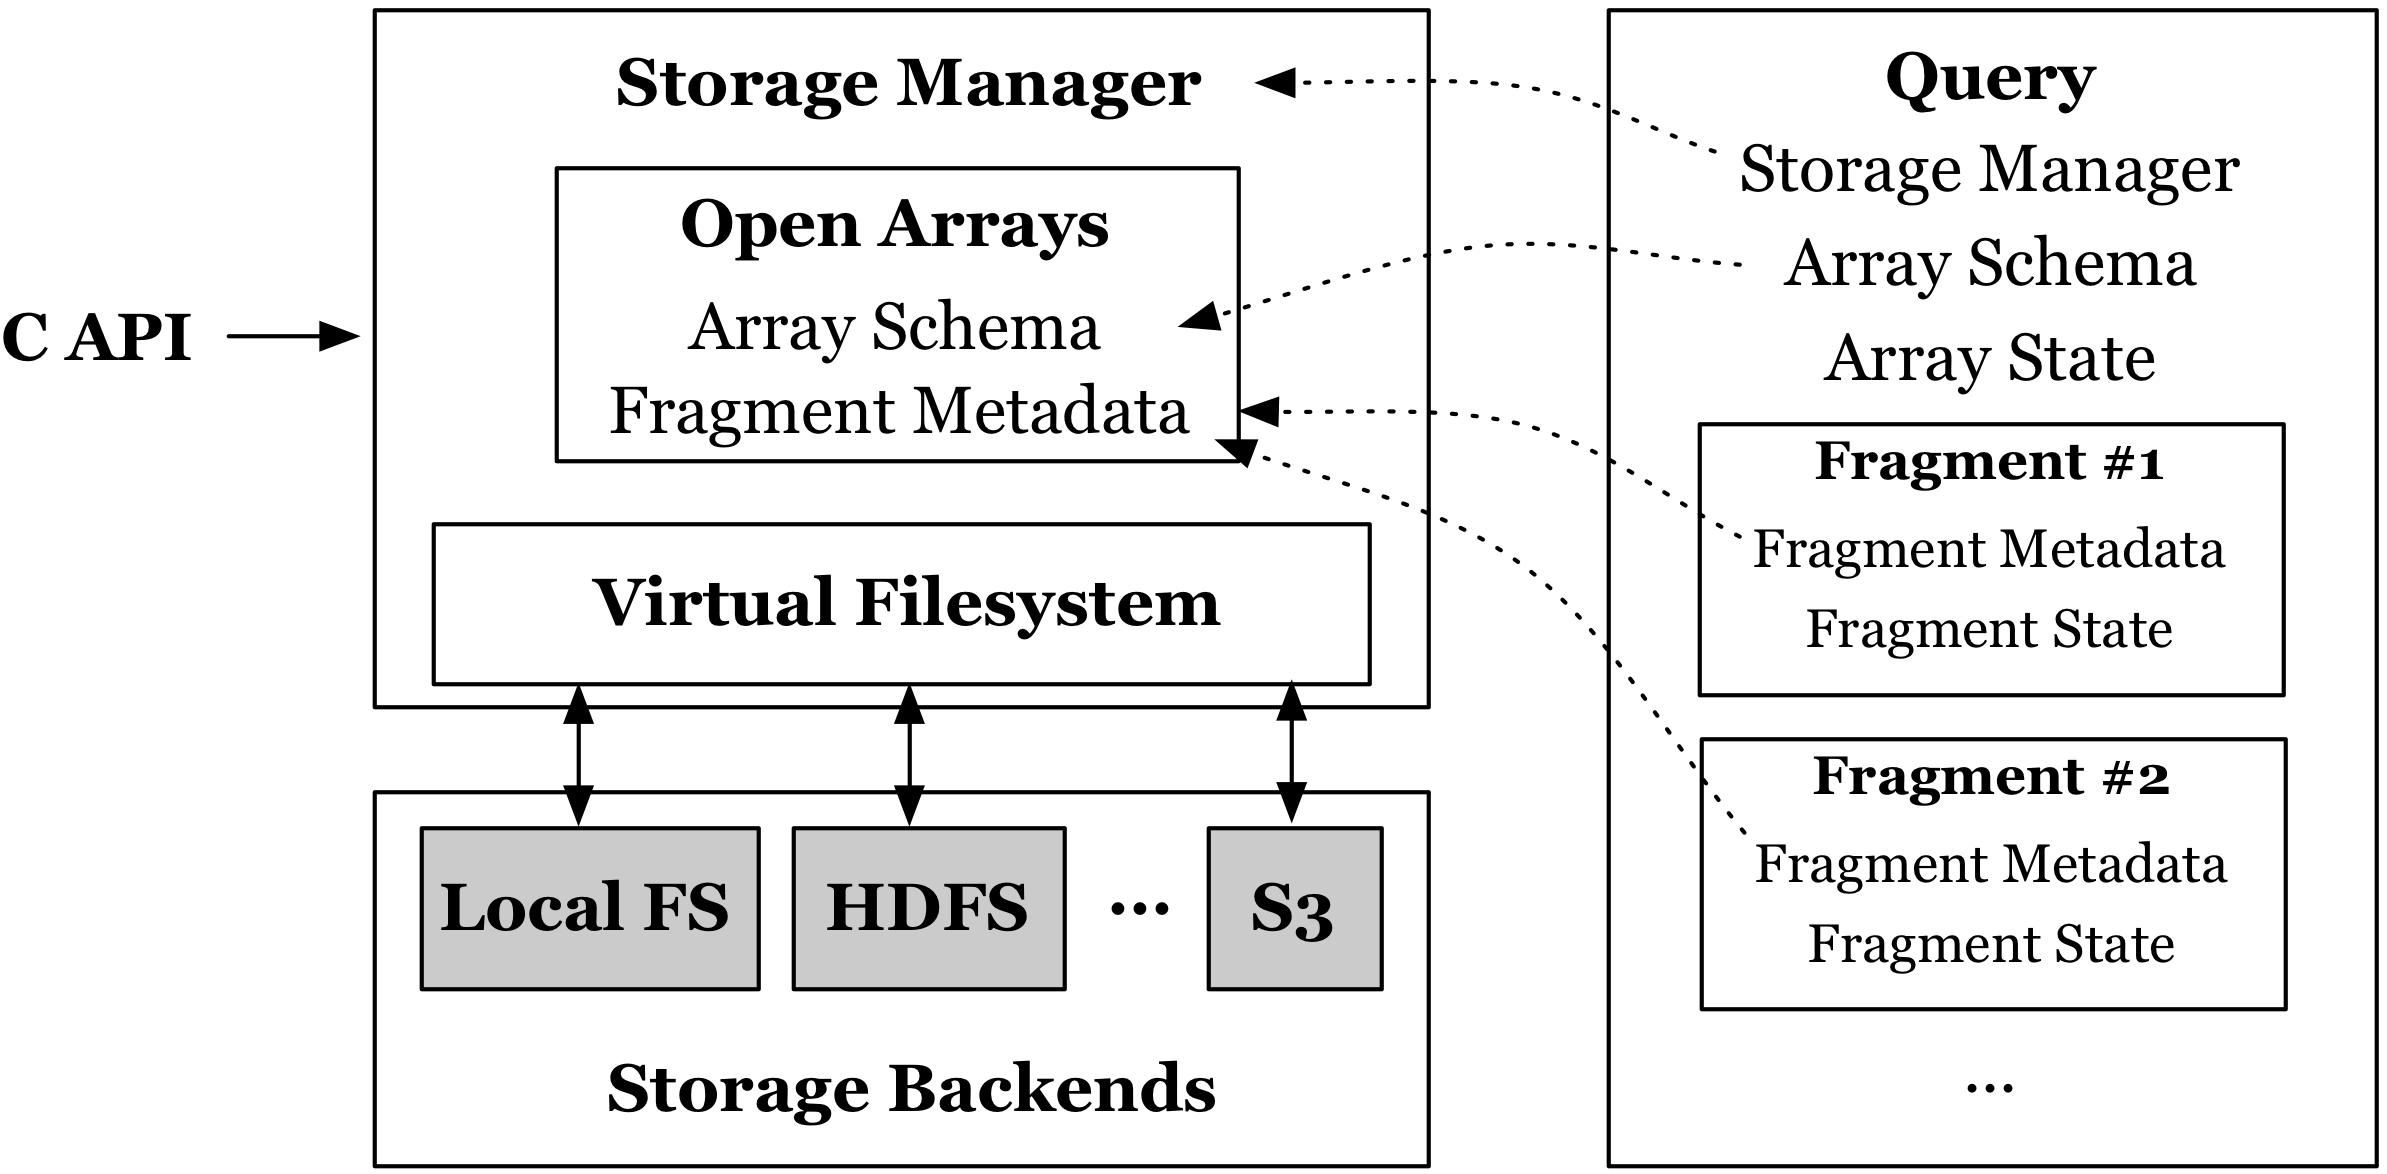 Figure 5: System architecture